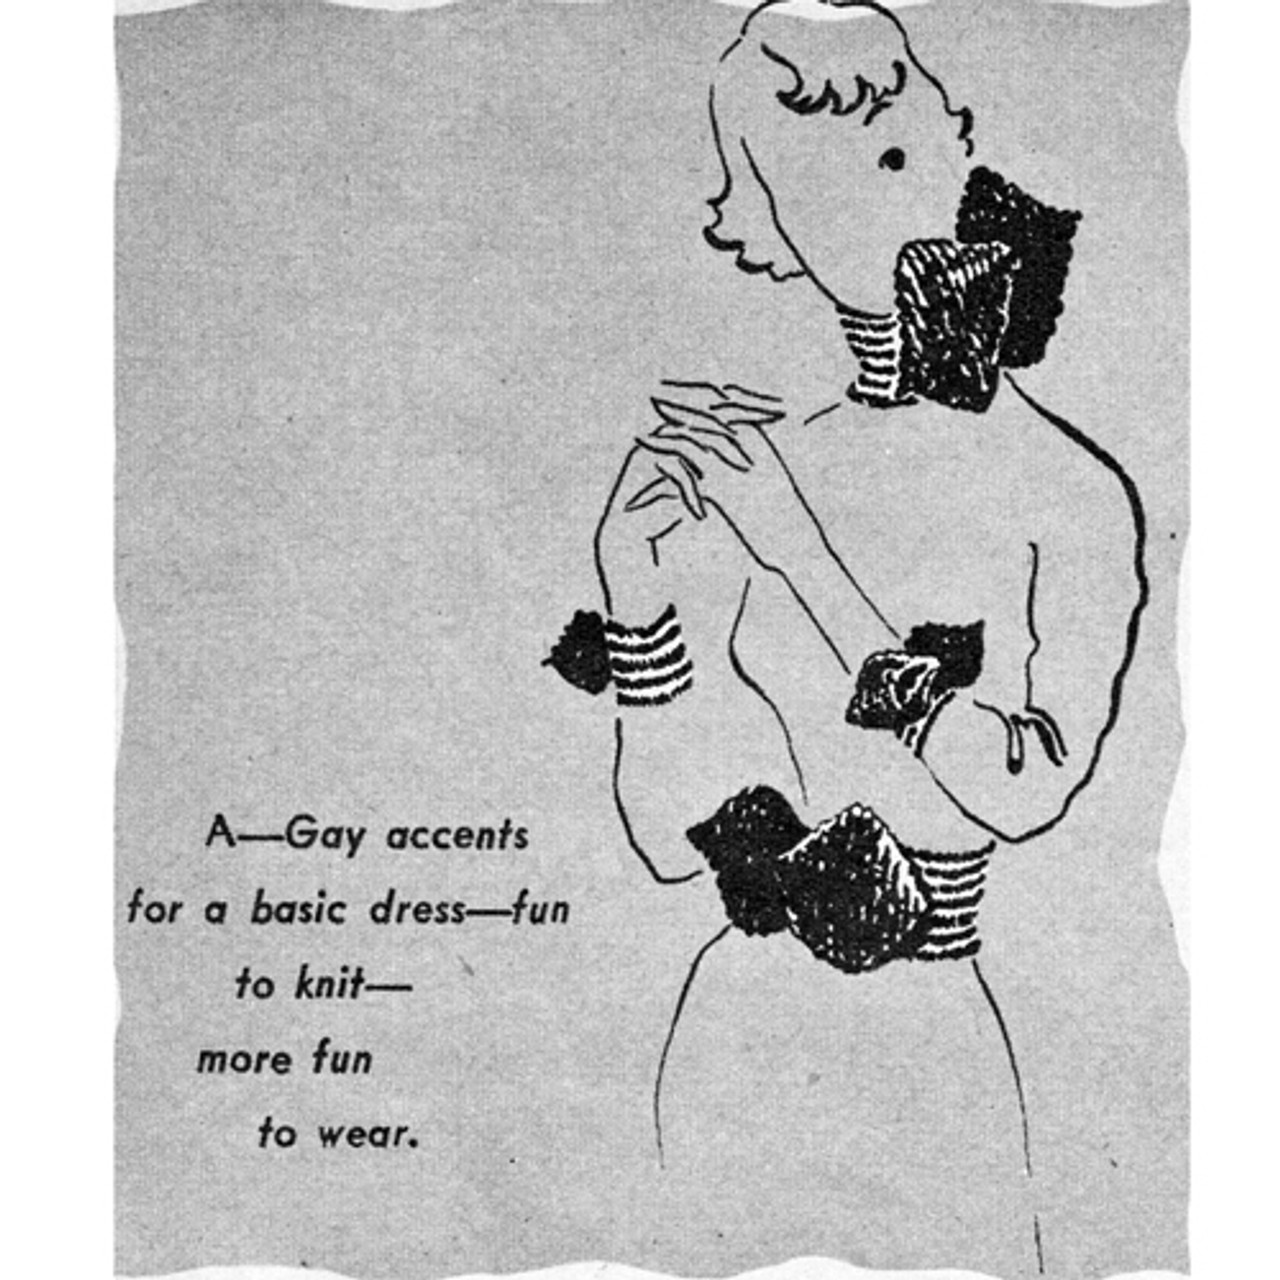 Vintage Knitting Pattern for Cummerbund with scarf and cuffs